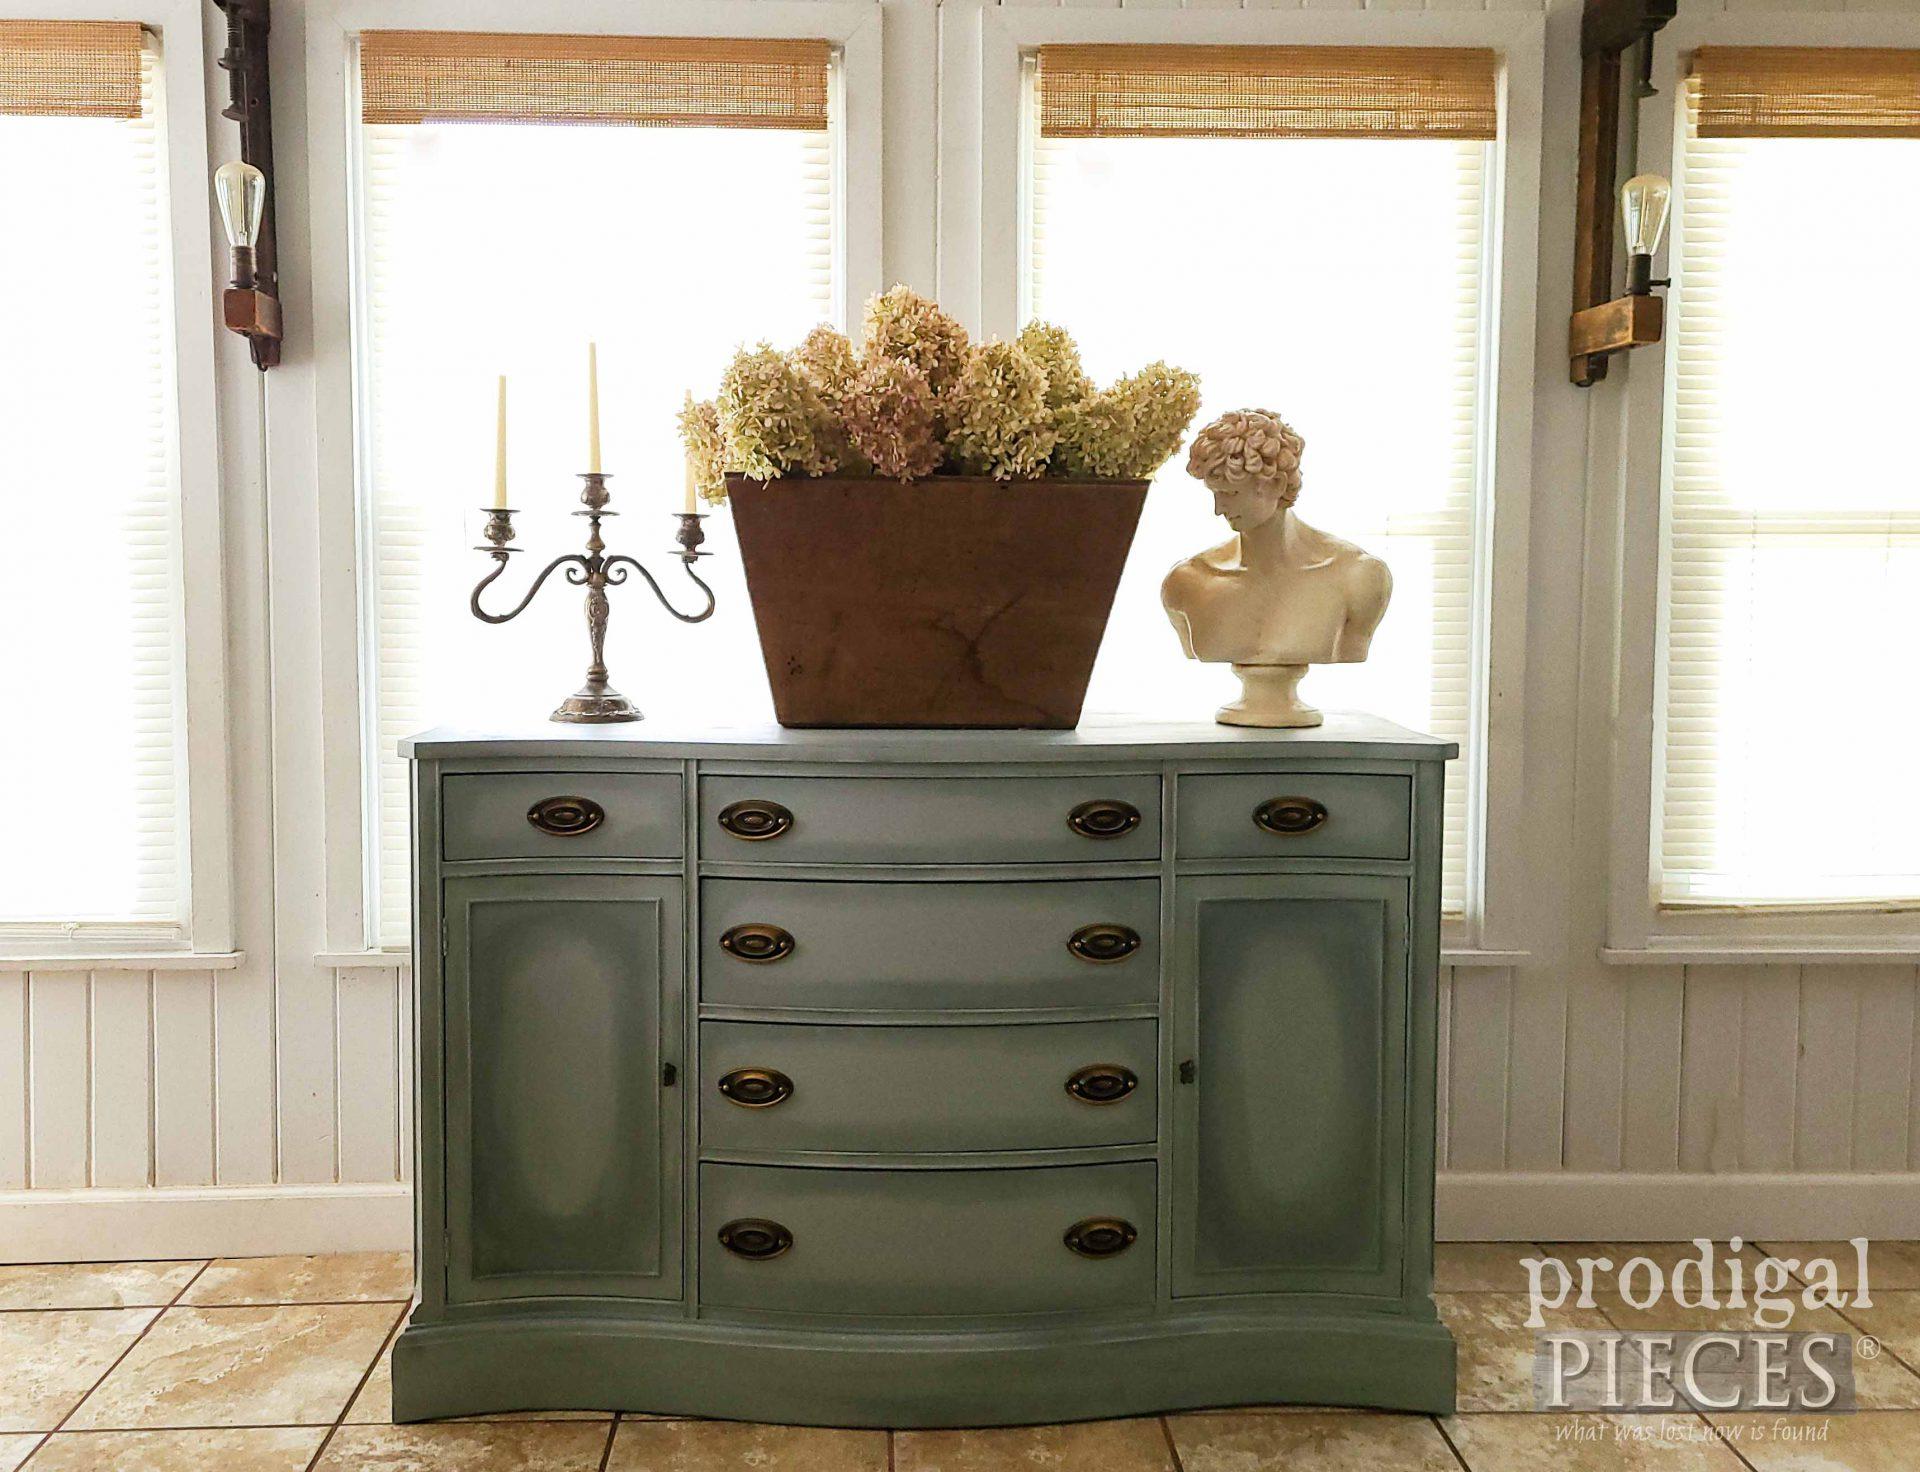 Vintage Bassett Buffet Made New by Larissa of Prodigal Pieces | prodigalpieces.com #prodigalpieces #vintage #antique #furniture #home #homedecor